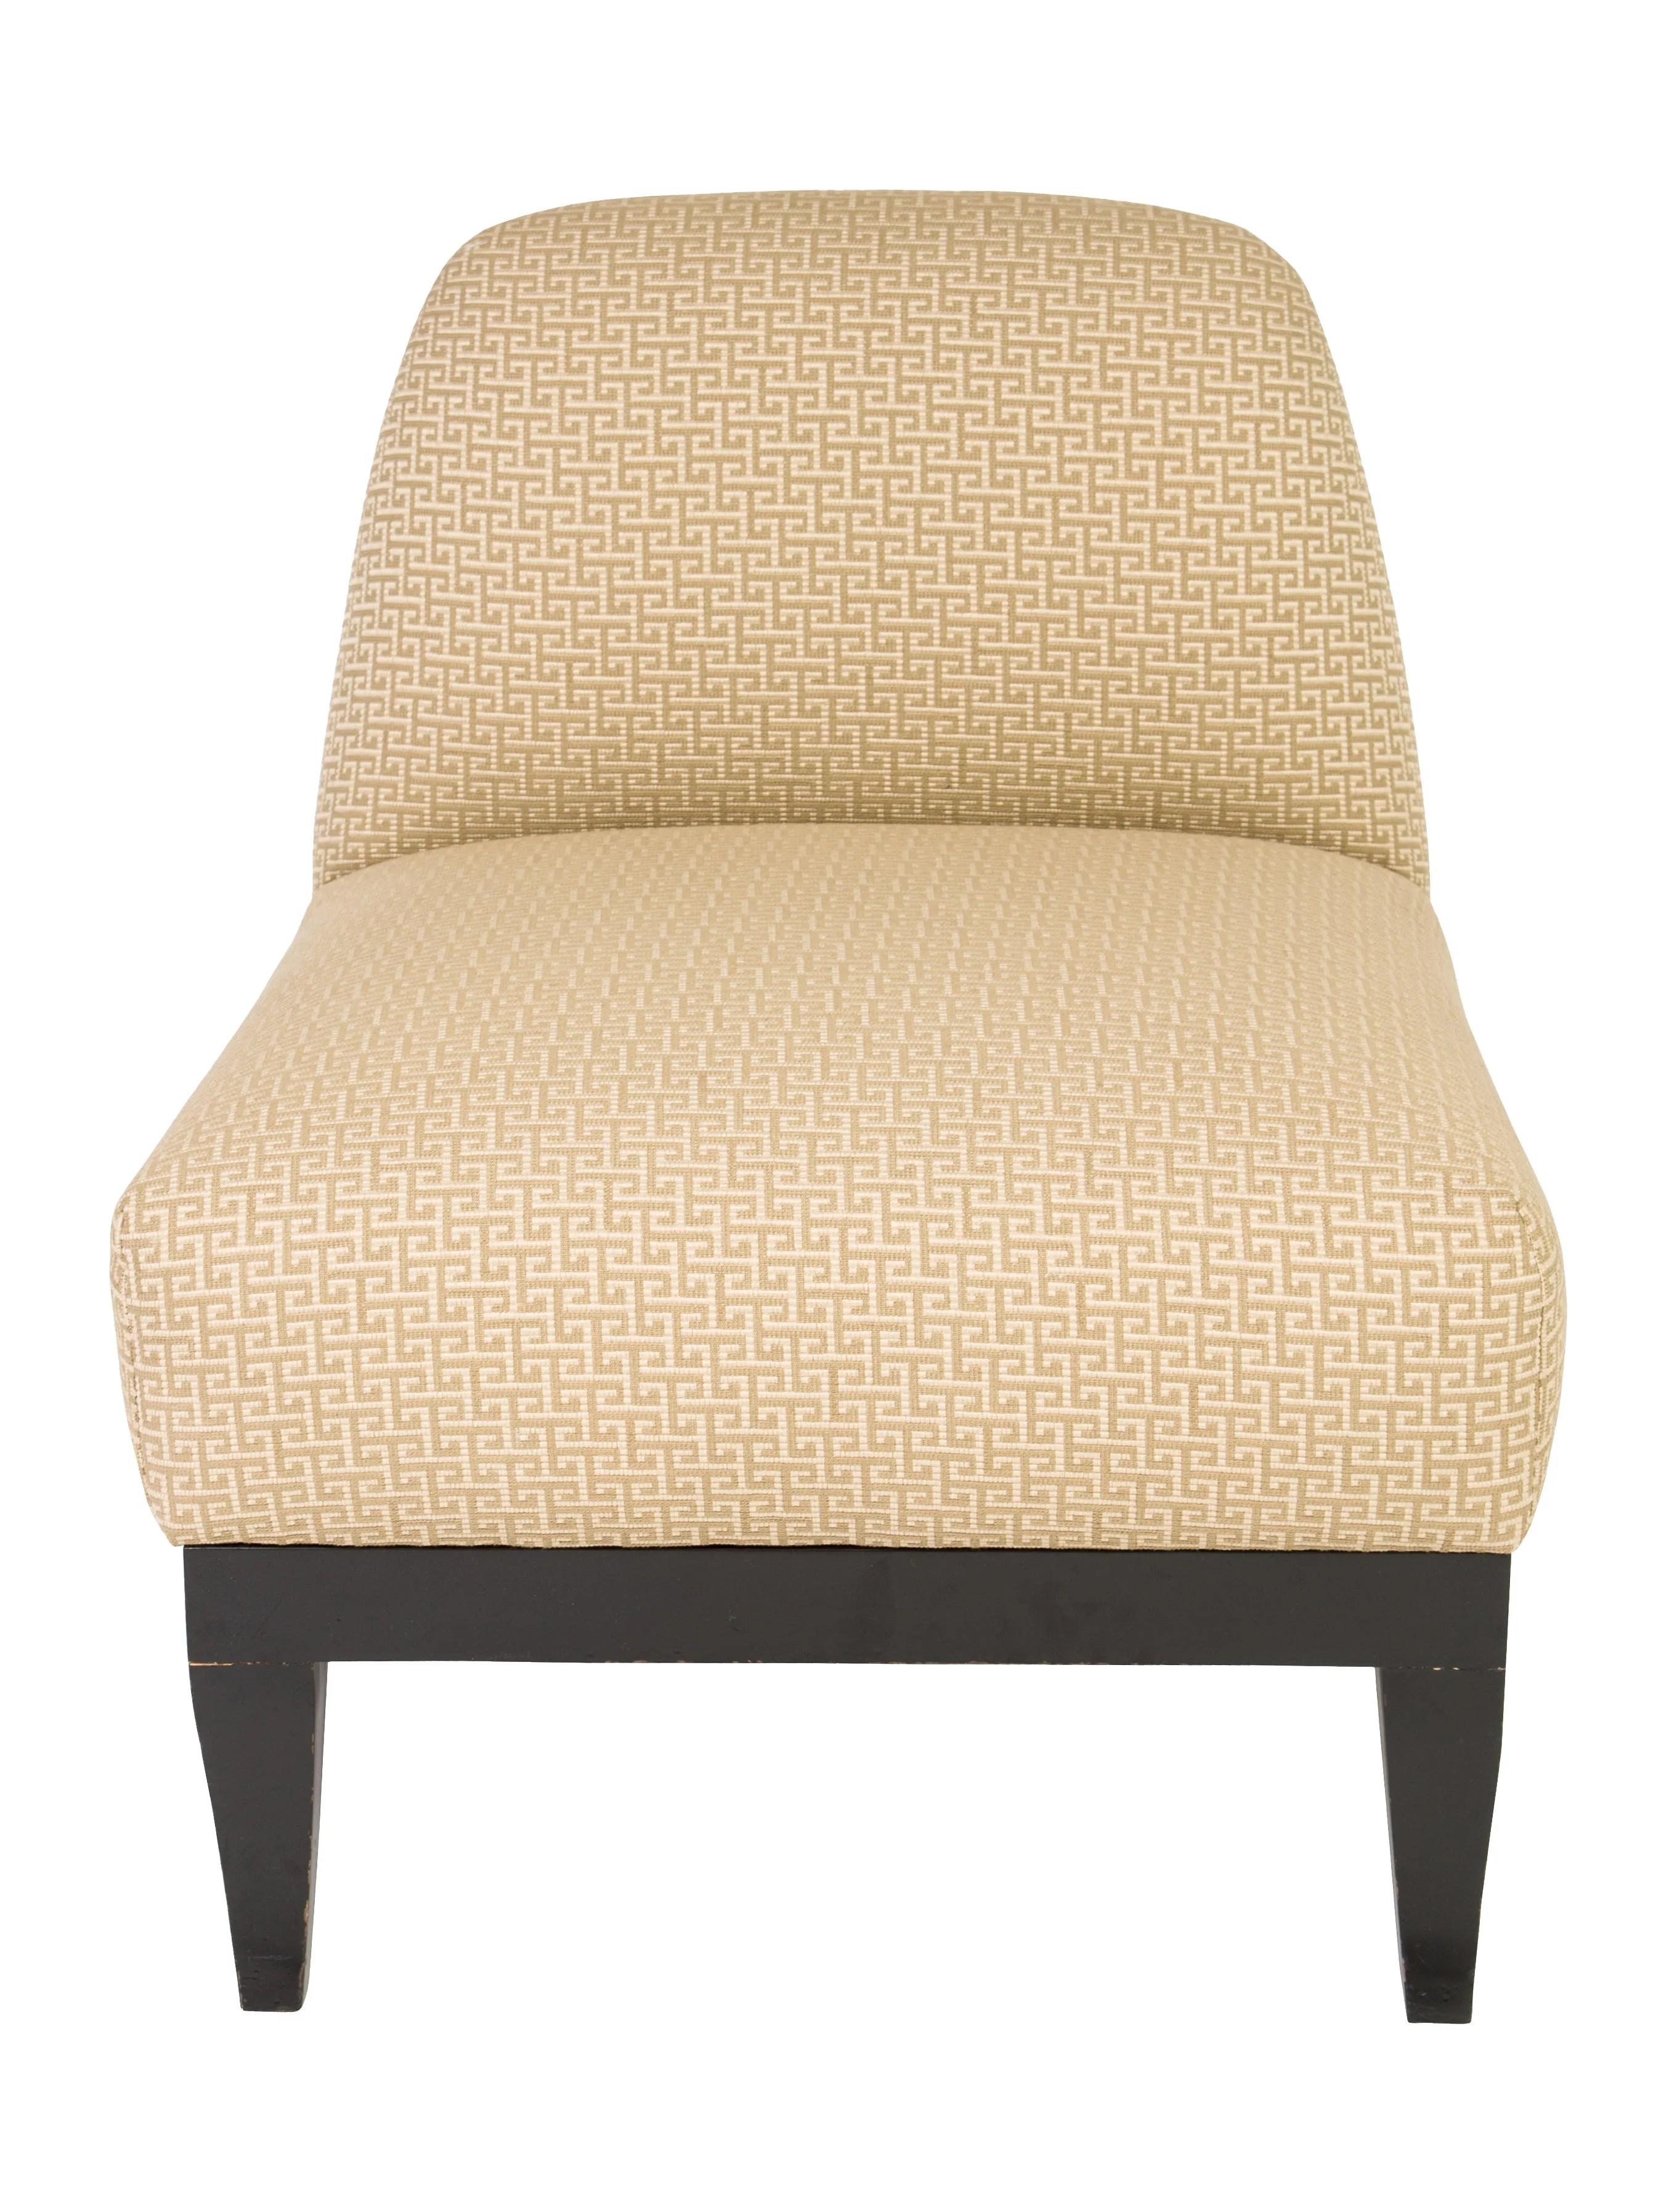 upholstered slipper chair world market cushions raul carrasco furniture